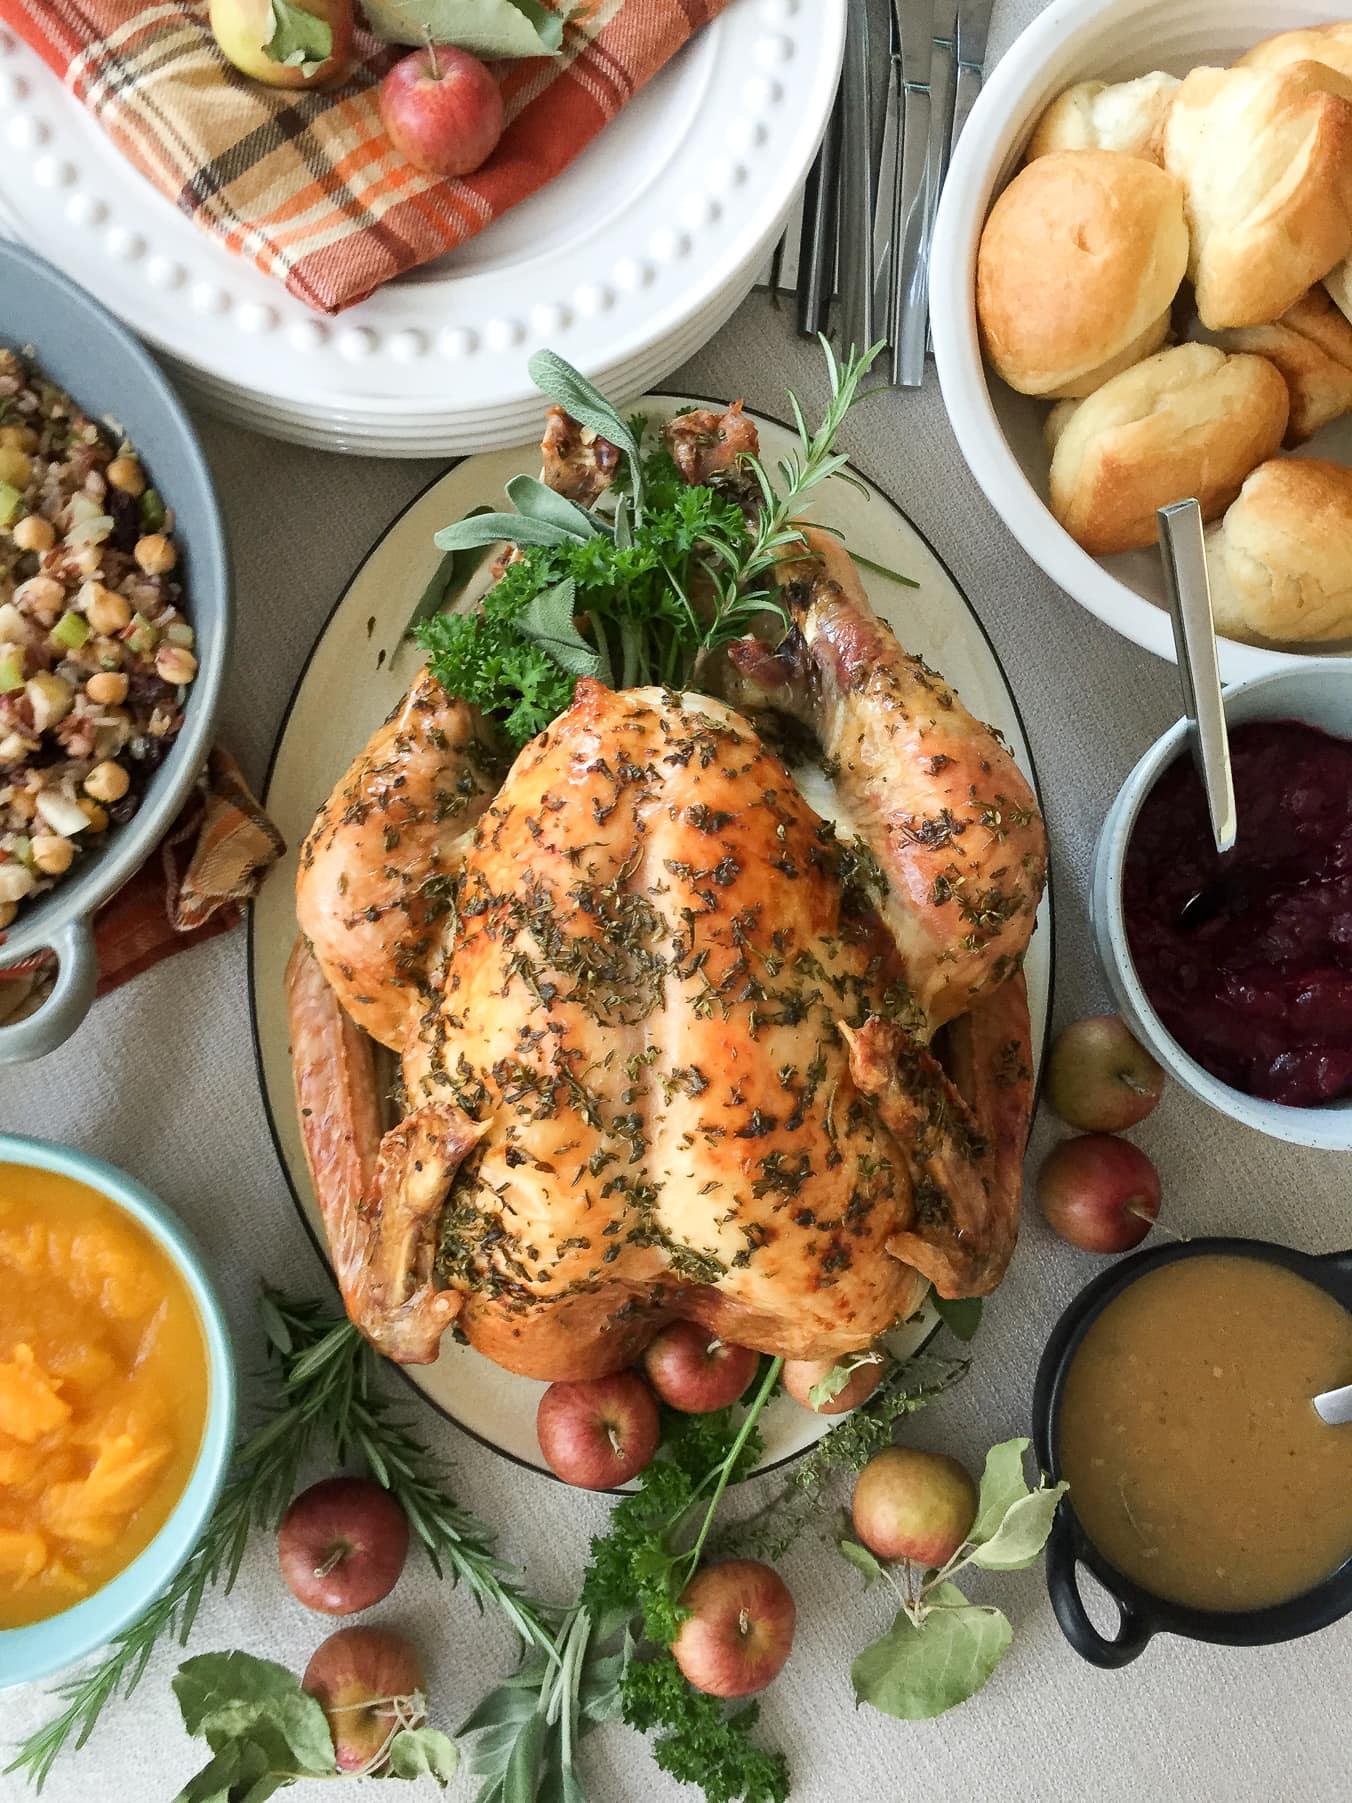 Traditional Roast Turkey with Pan Gravy